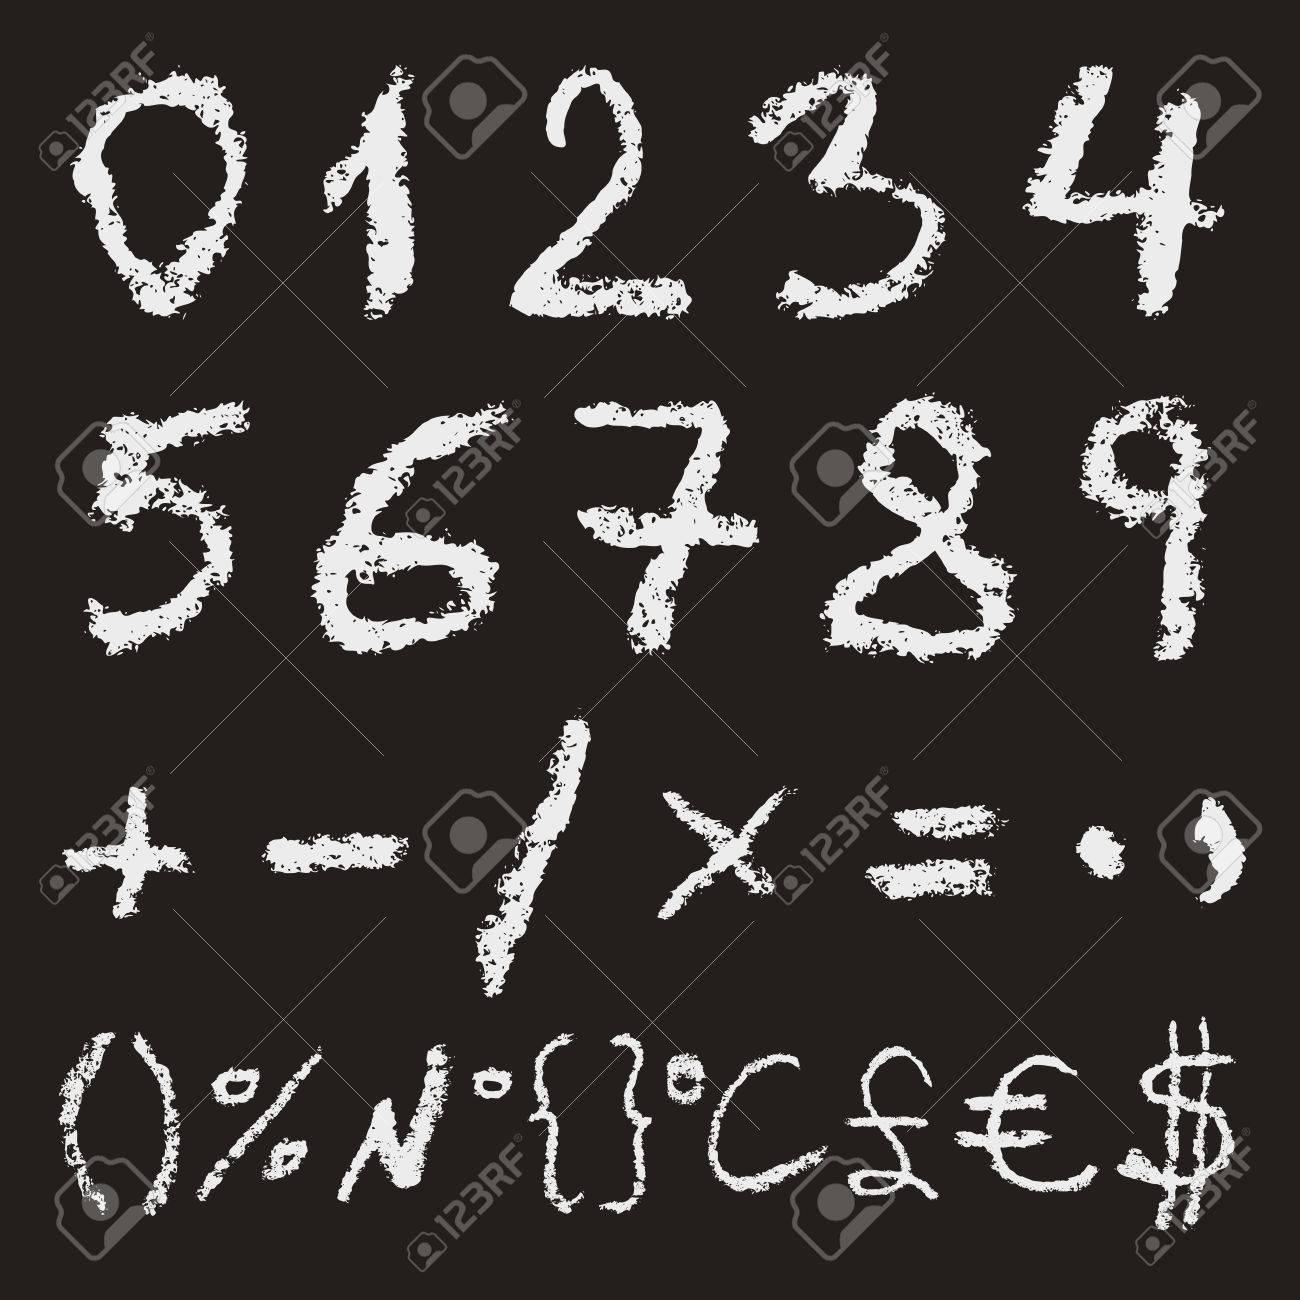 Hand written chalk numbers 0 1 2 3 4 5 6 7 8 9 hand written chalk numbers 0 1 2 3 4 5 biocorpaavc